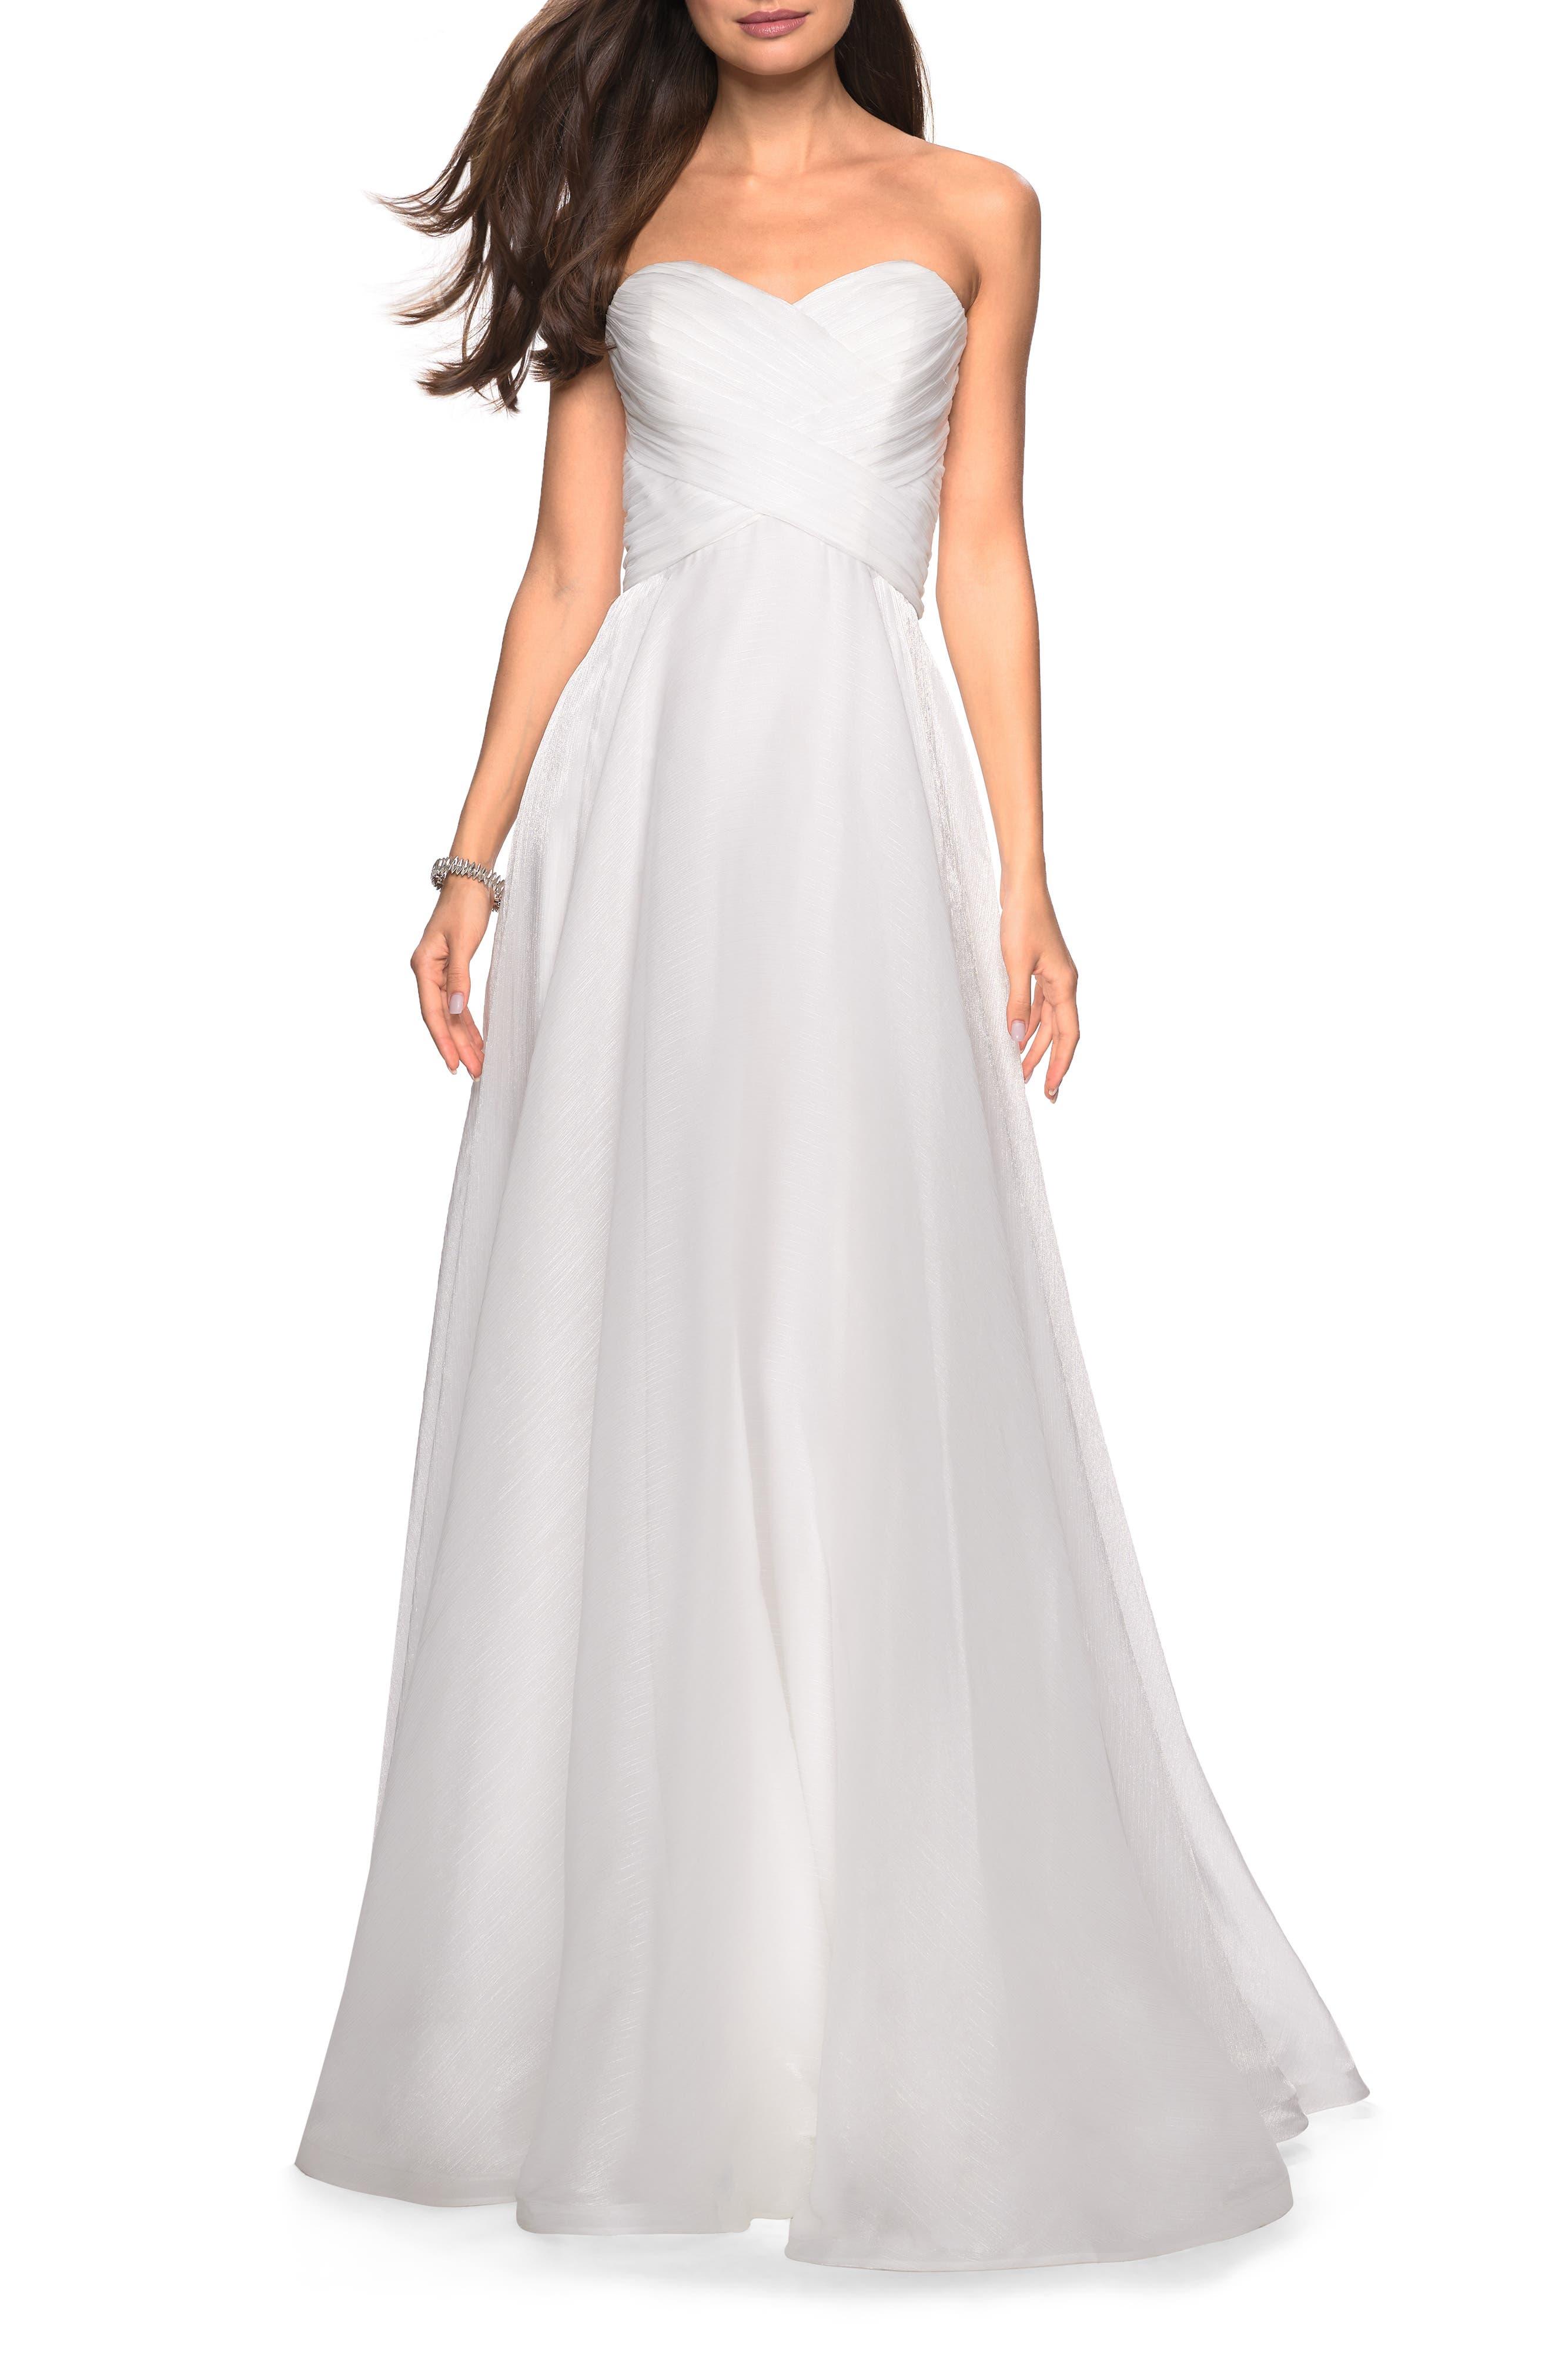 La Femme Strapless Metallic Chiffon Evening Dress, White